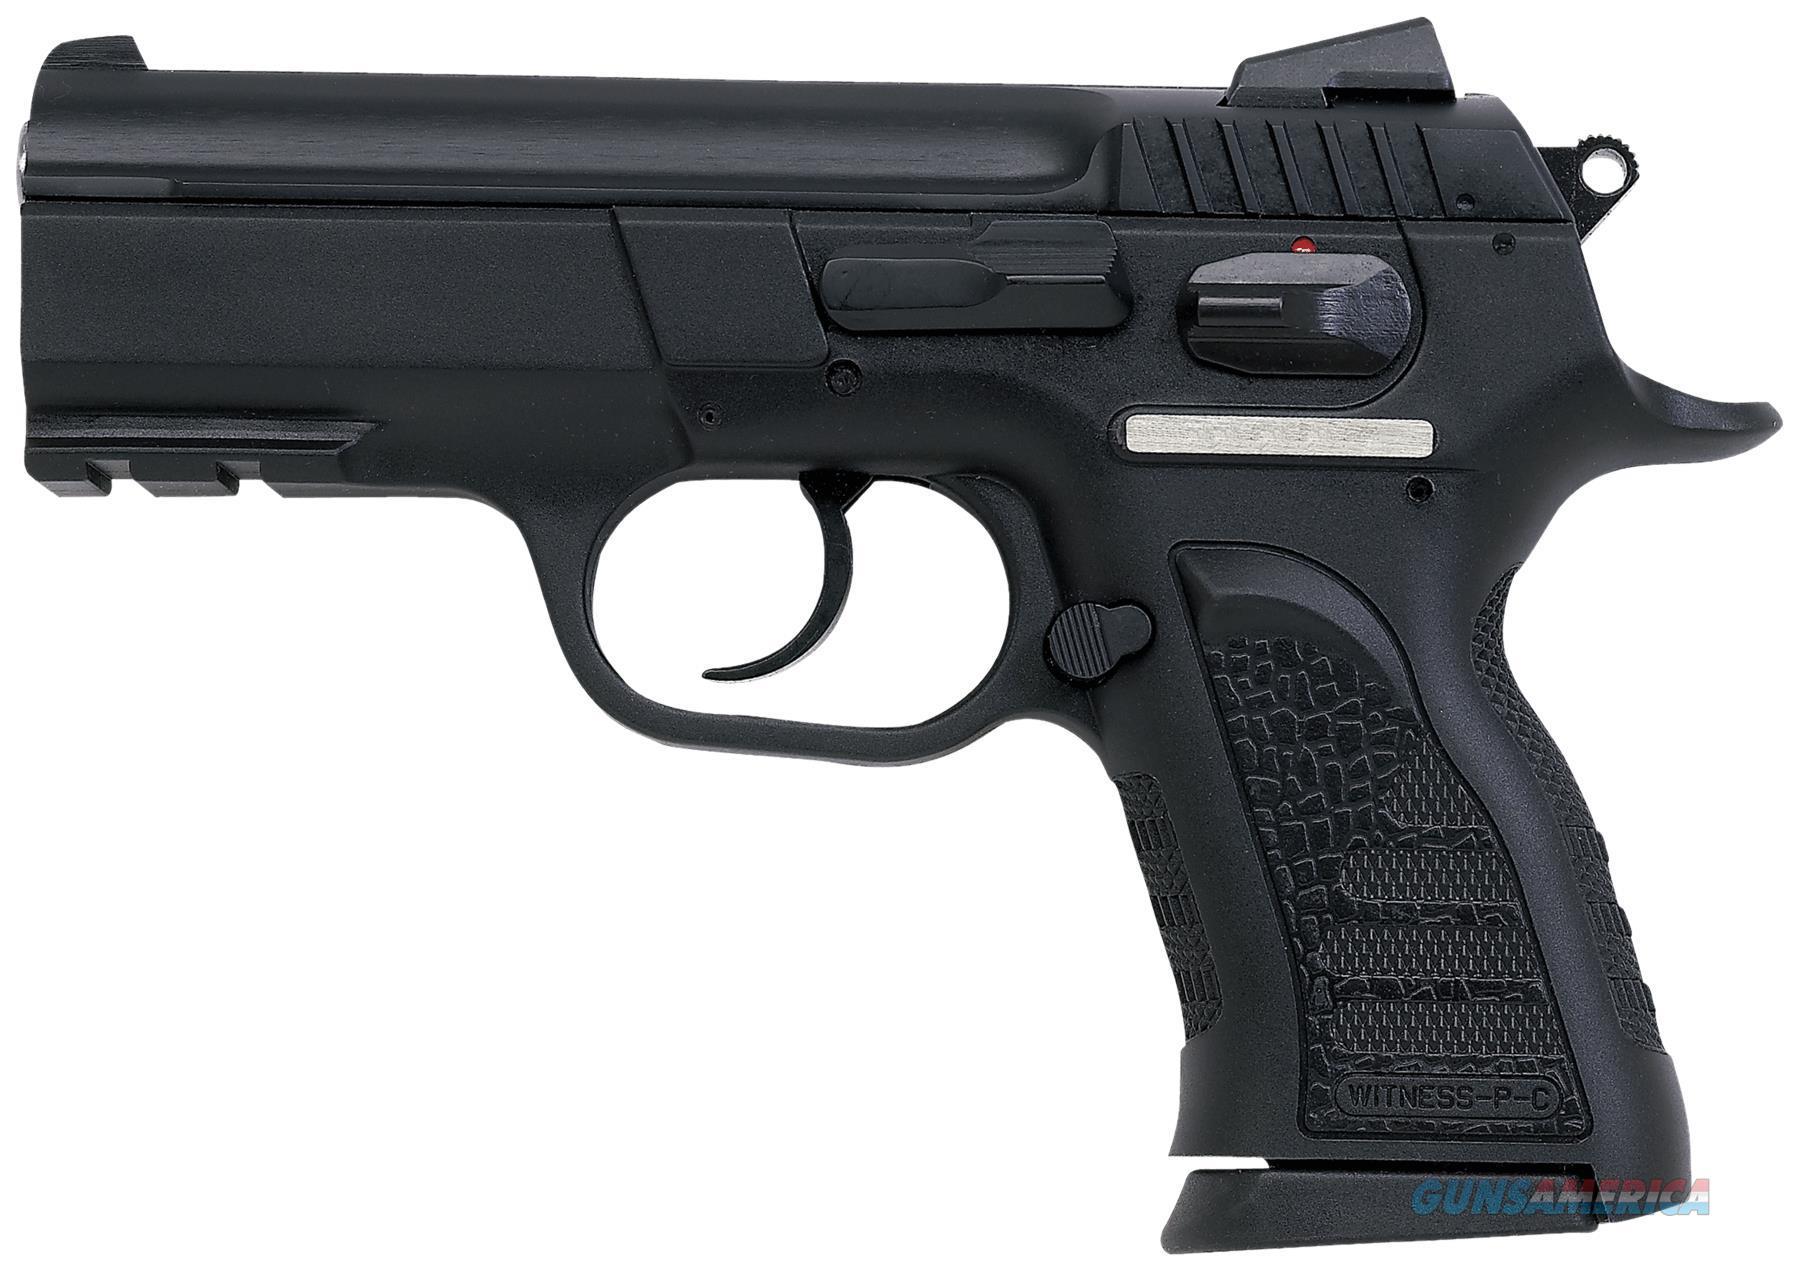 "Eaa 999106 Witness P Compact Sa/Da 9Mm 3.6"" 14+1 Poly Grip/Frame Black 999106  Guns > Pistols > E Misc Pistols"